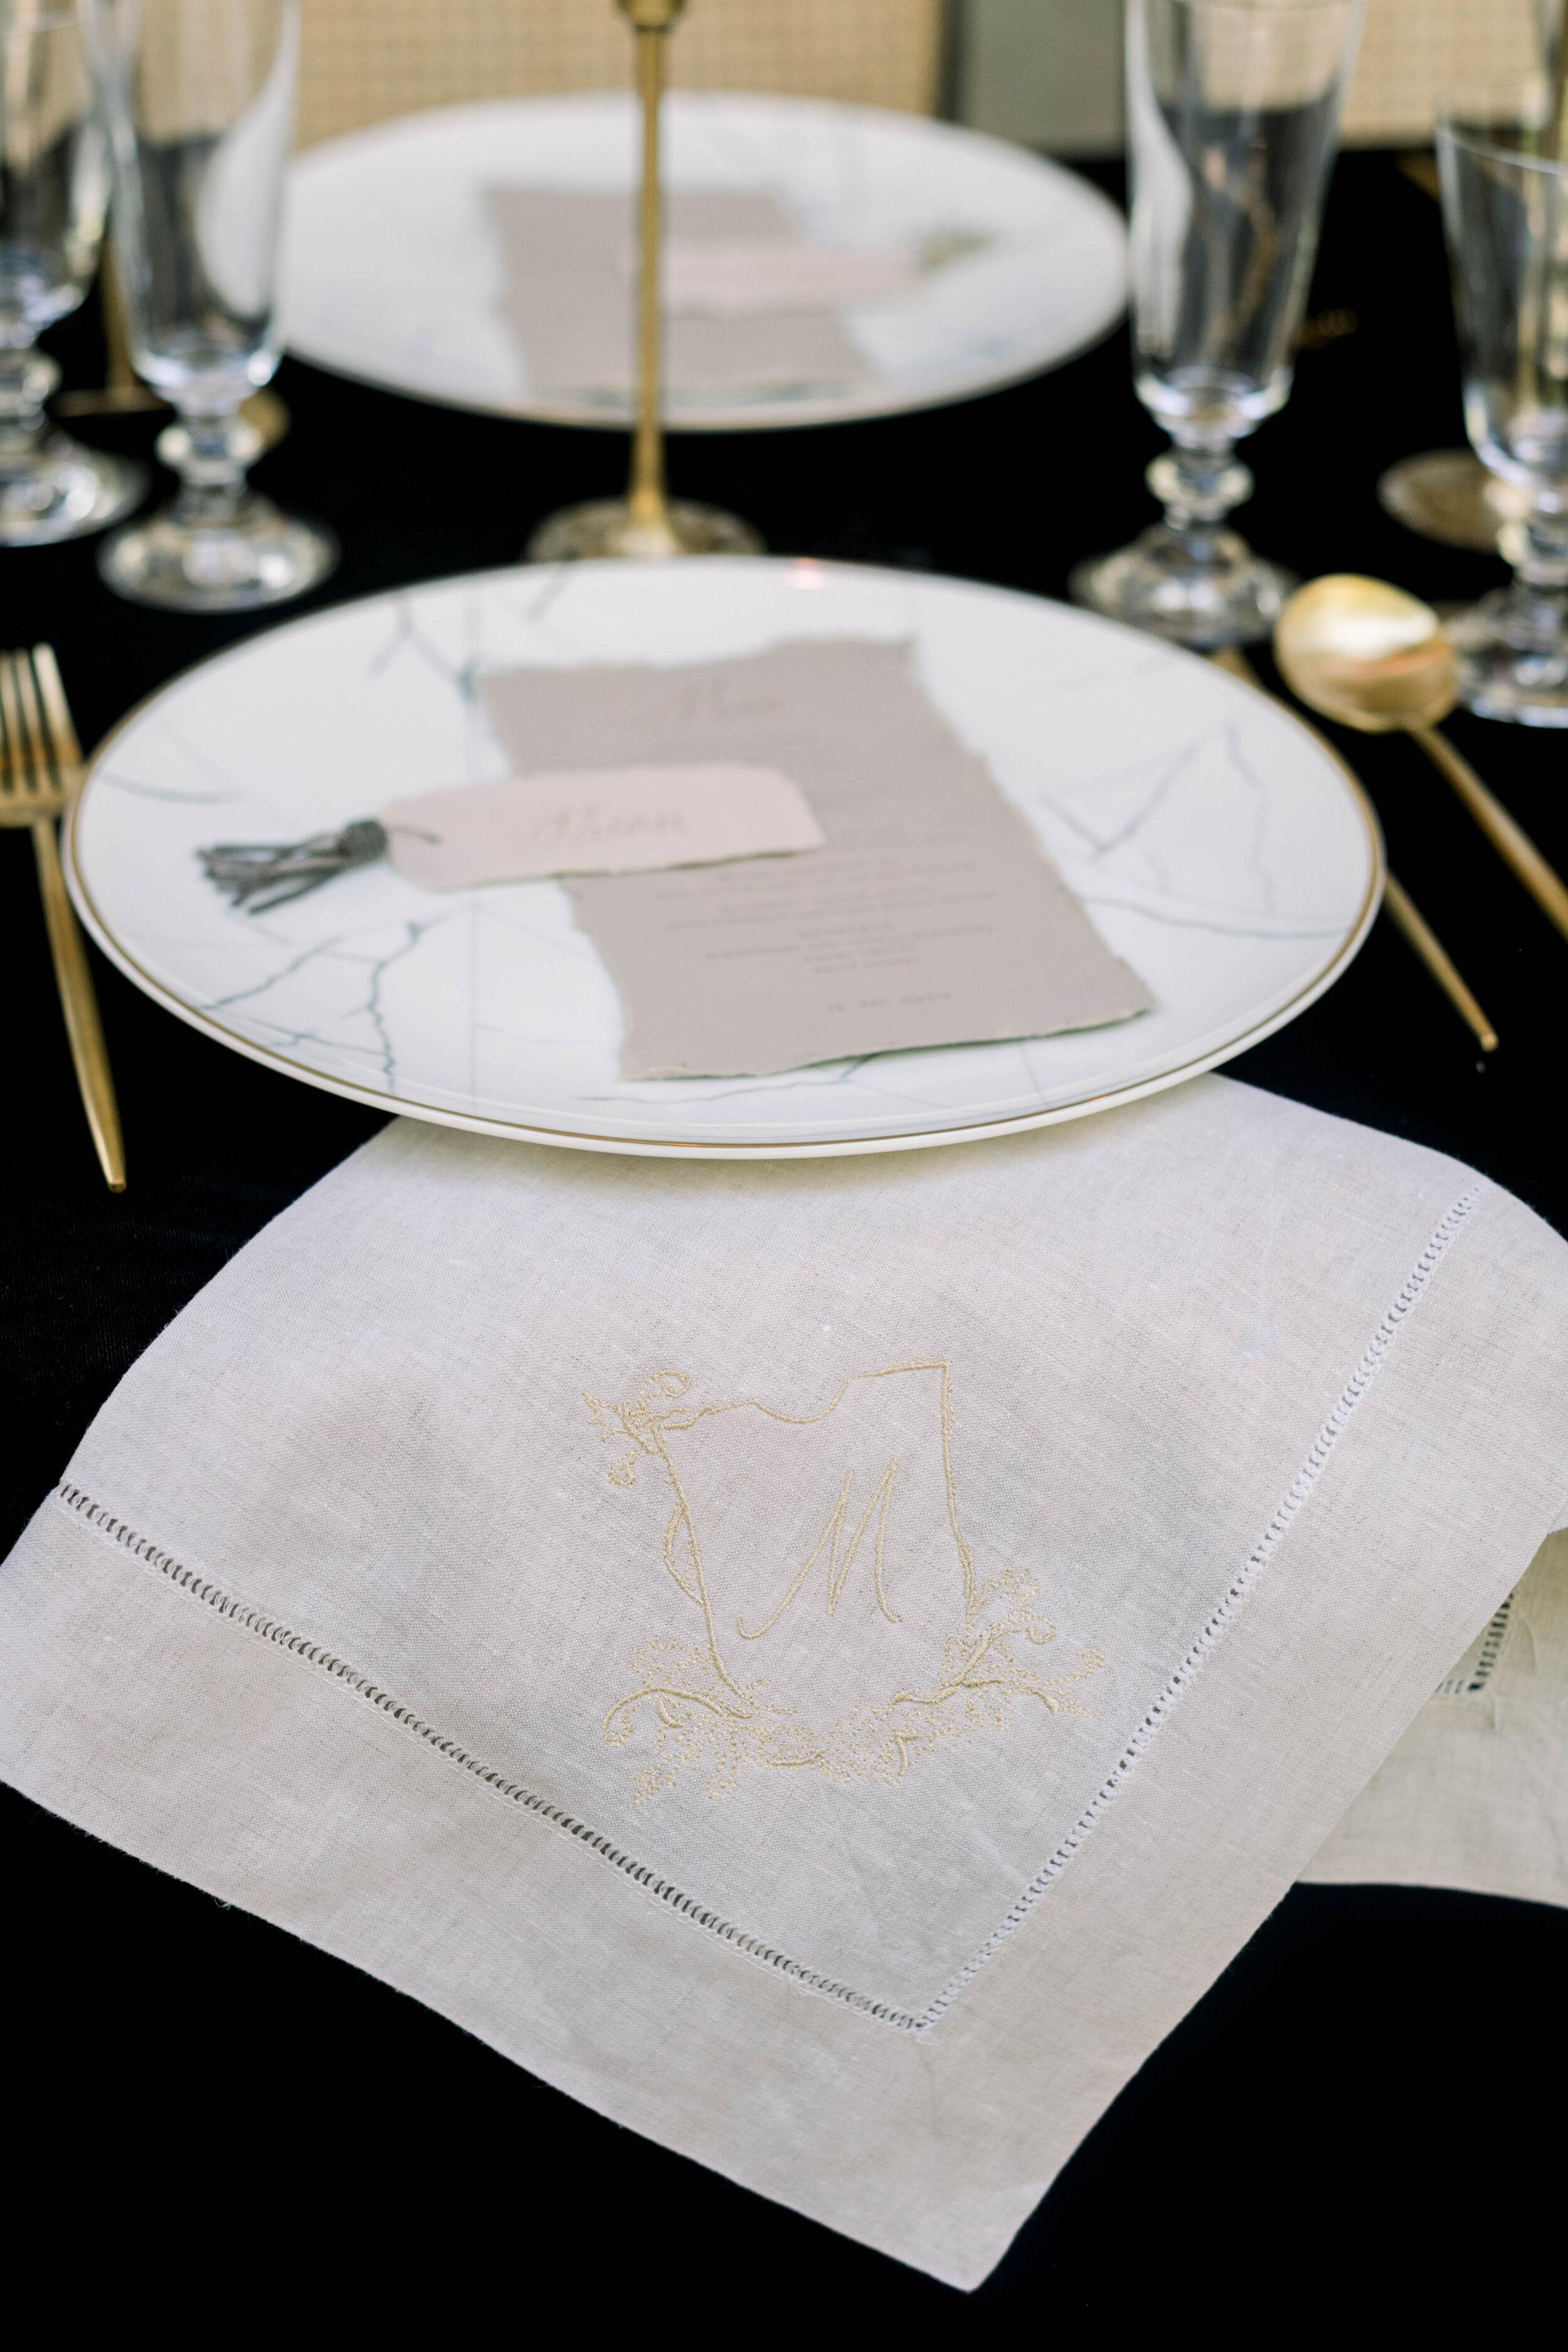 fine art wedding, Atlanta wedding, swan house wedding, modern wedding, rolls Royce wedding, swan house, high neck wedding dress, white tux, custom napkins, black velvet tablecloth